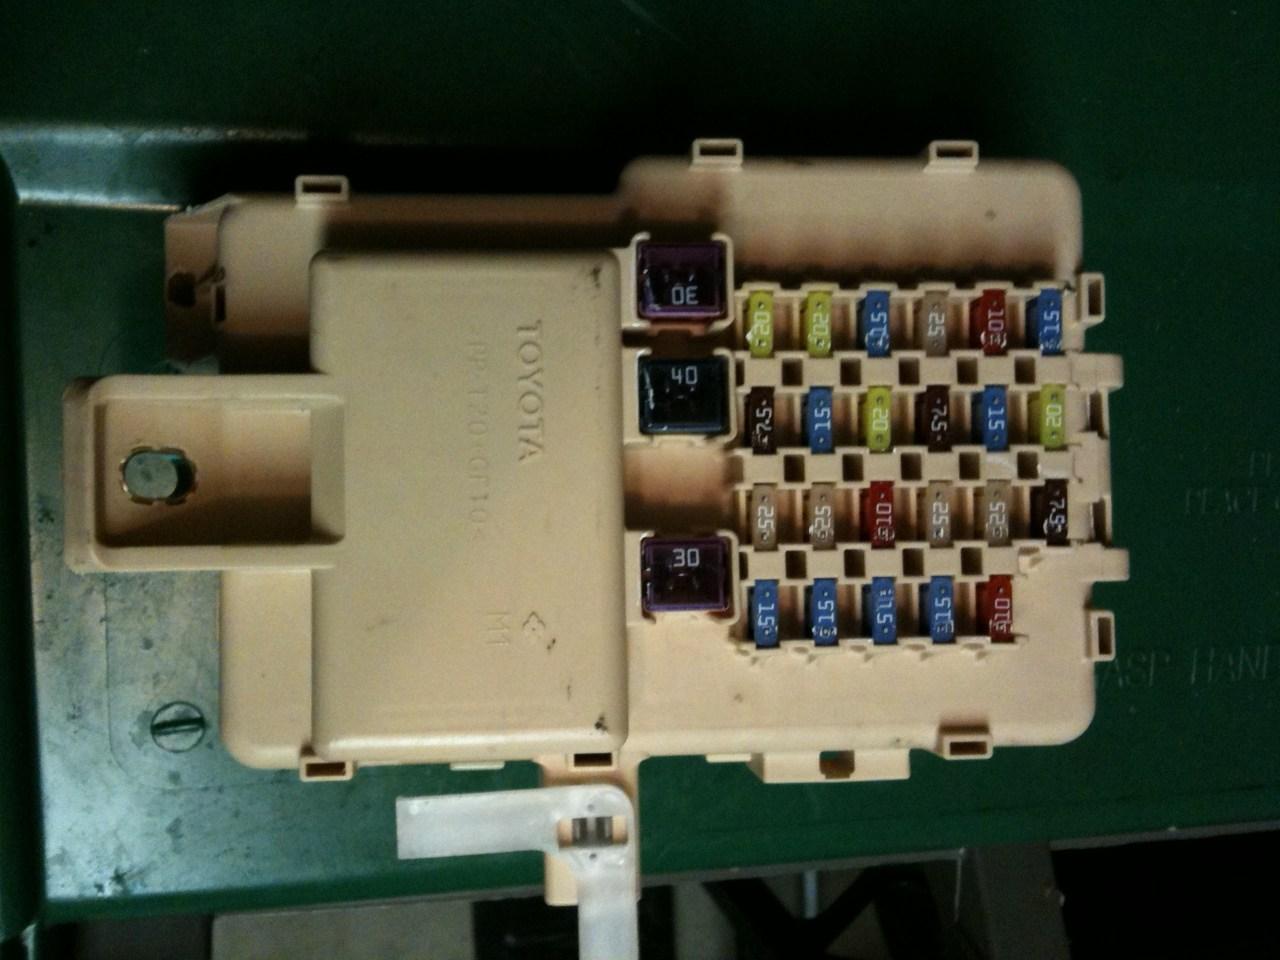 2004 toyota tacoma fuse box diagram double pole switch wiring 2012 tundra